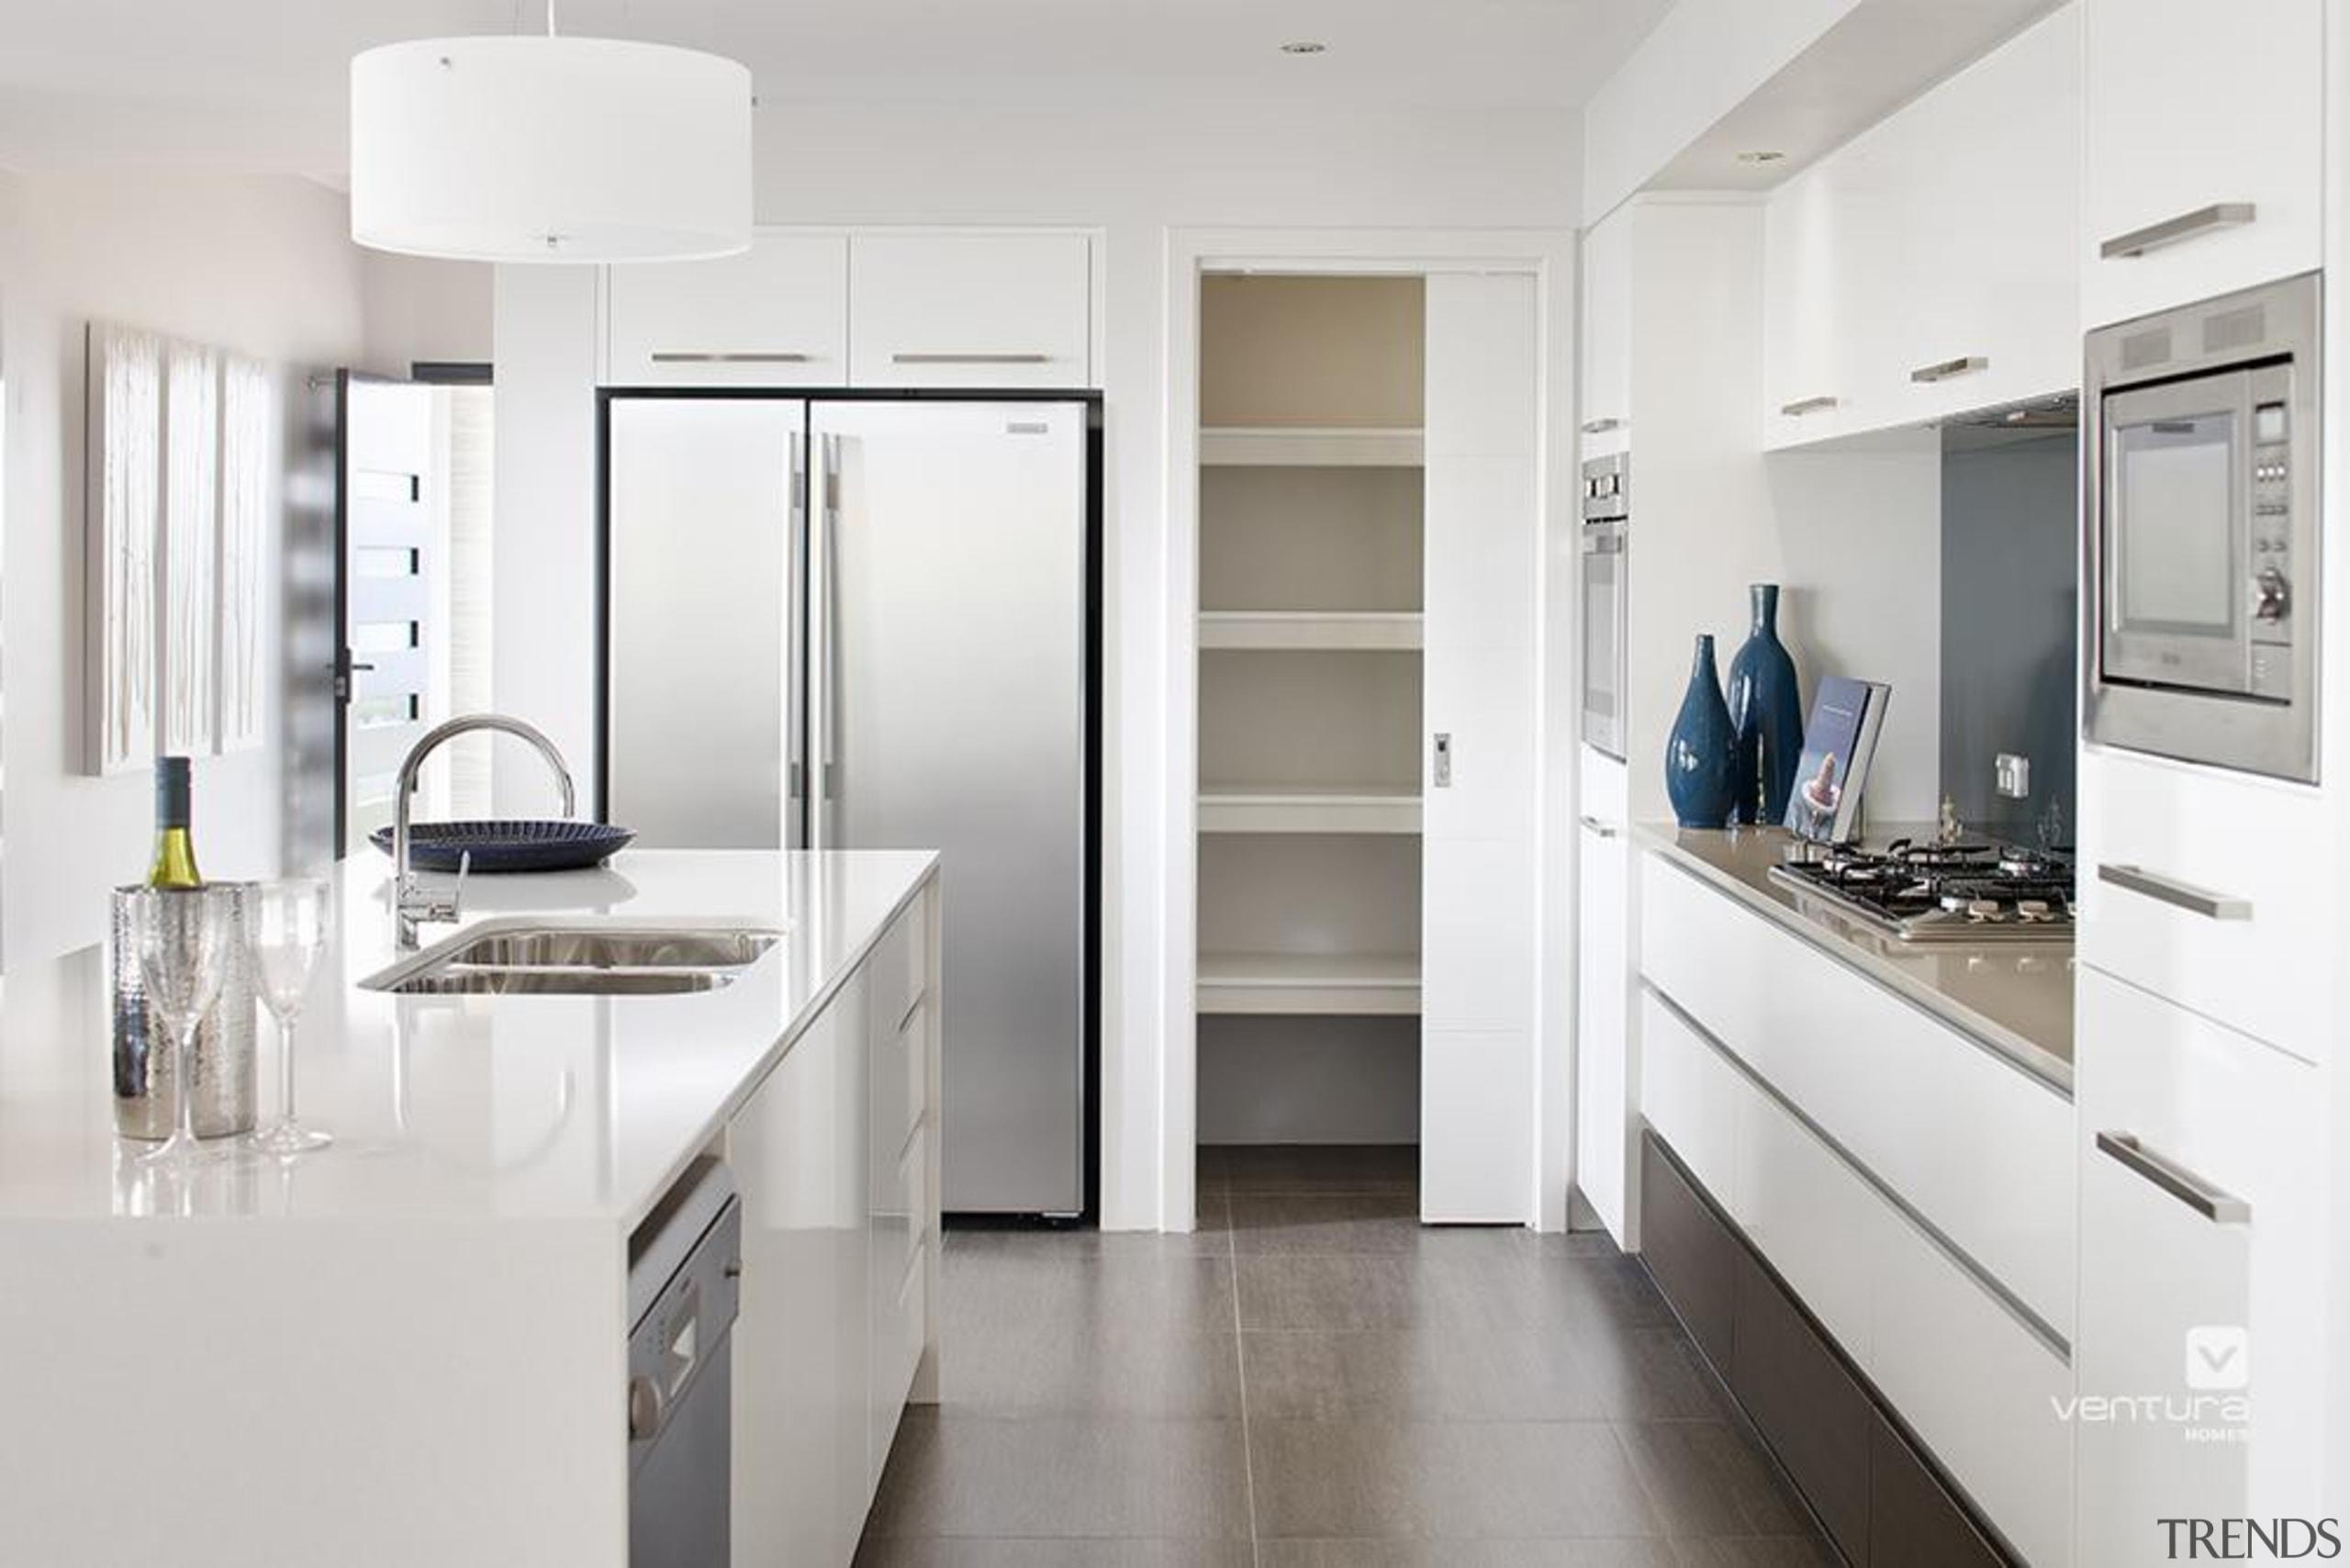 Kitchen design. - The Temptation Display Home - countertop, cuisine classique, home appliance, interior design, kitchen, major appliance, room, white